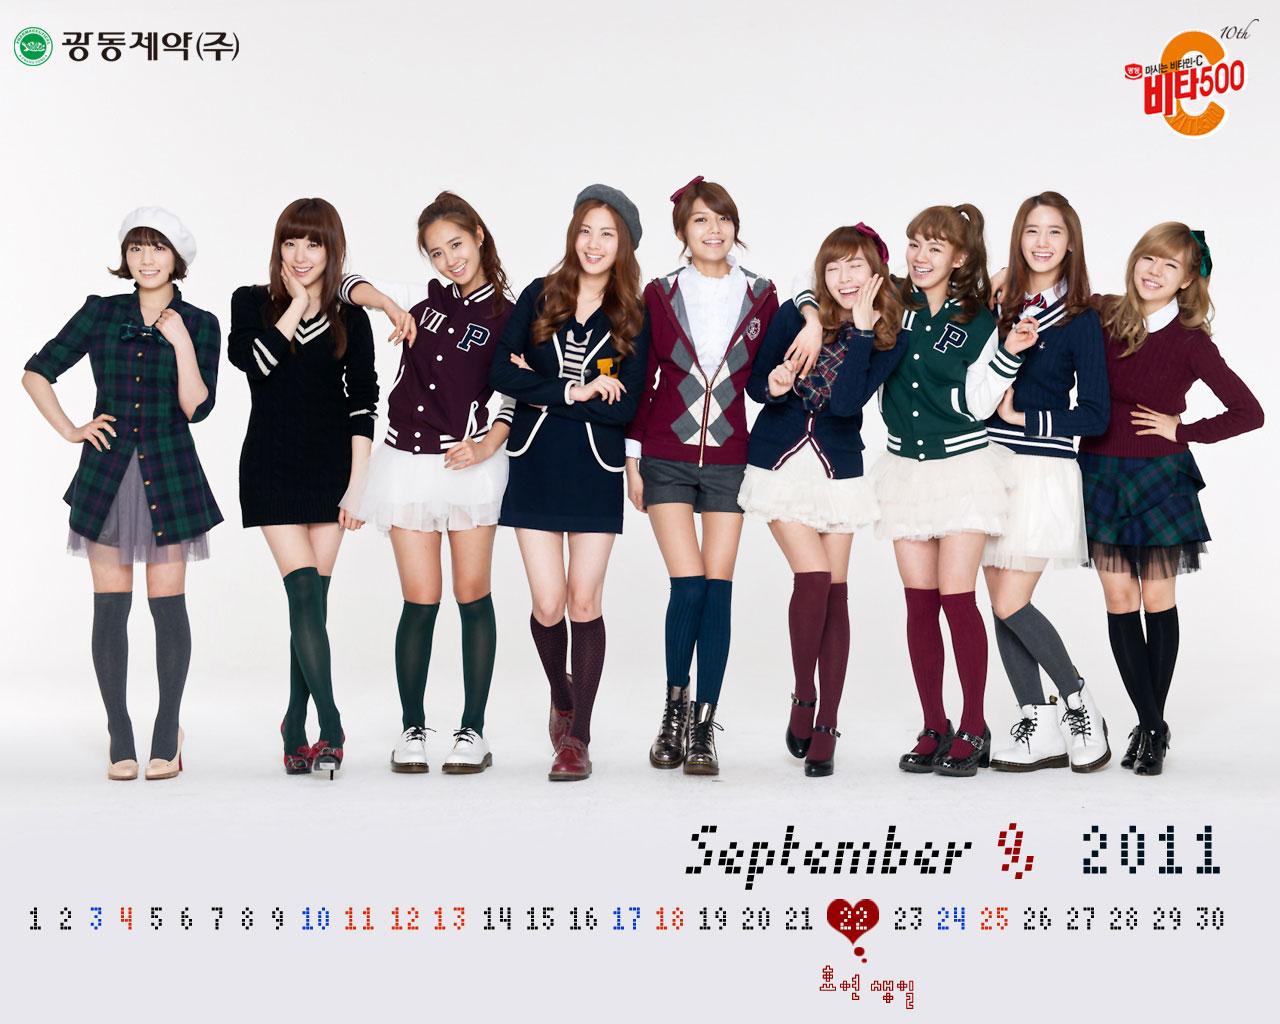 SNSD Vita500 September 2011 calendar wallpaper